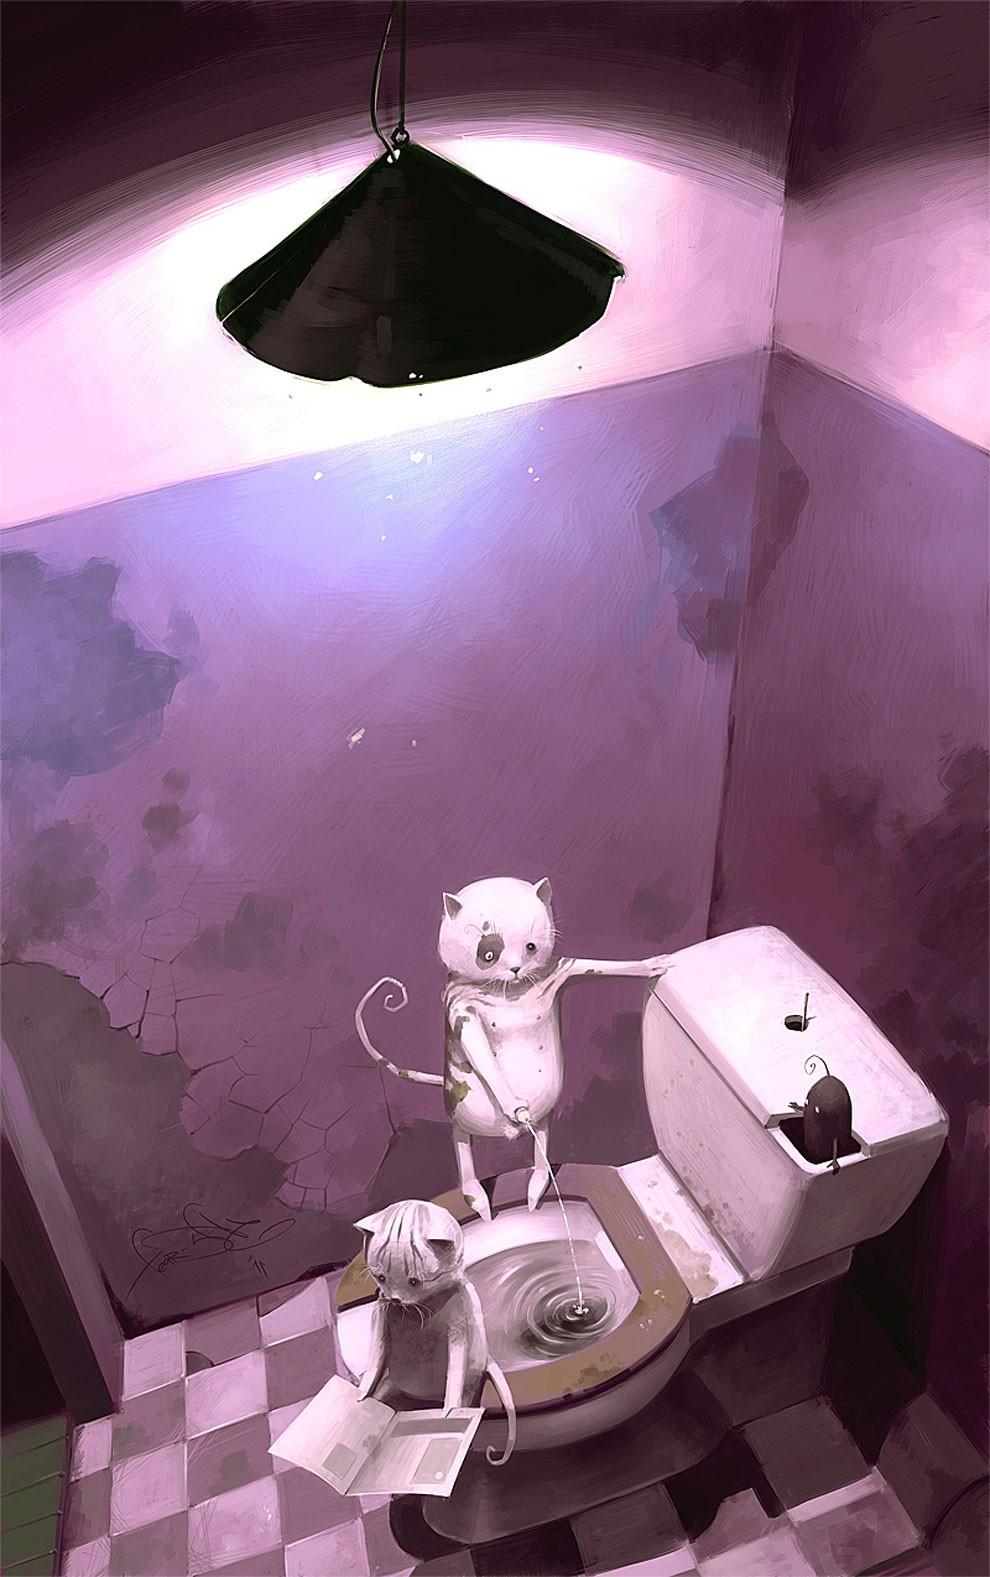 illustrazioni-dipinti-digitali-humor-horror-fantasy-sergey-svistunov-46